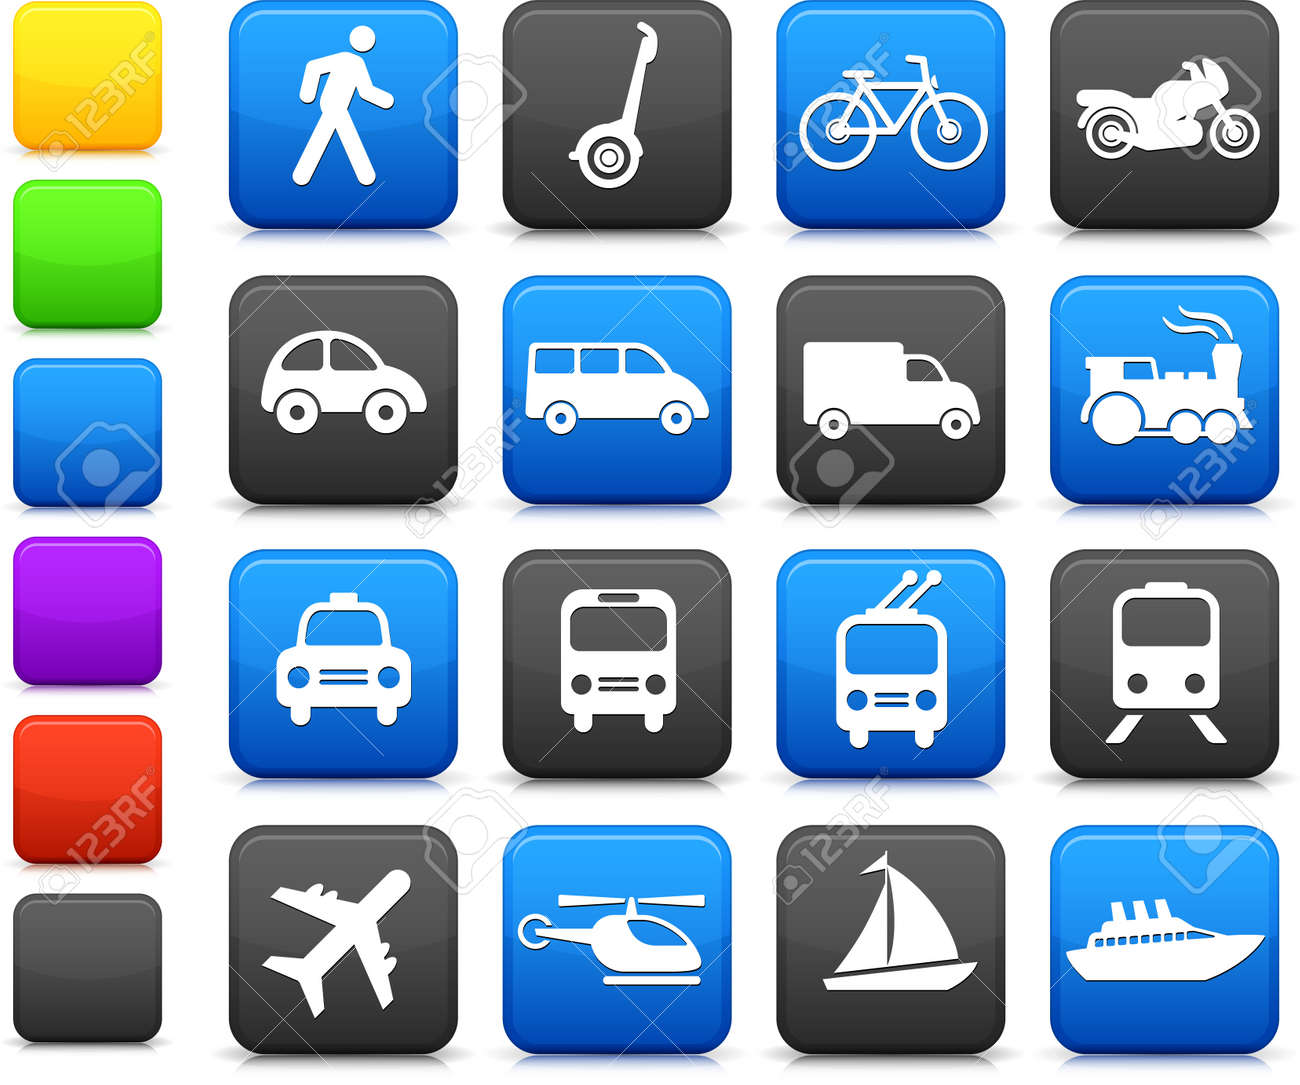 Original vector illustration: Transportation icons design elements Stock Vector - 22419234